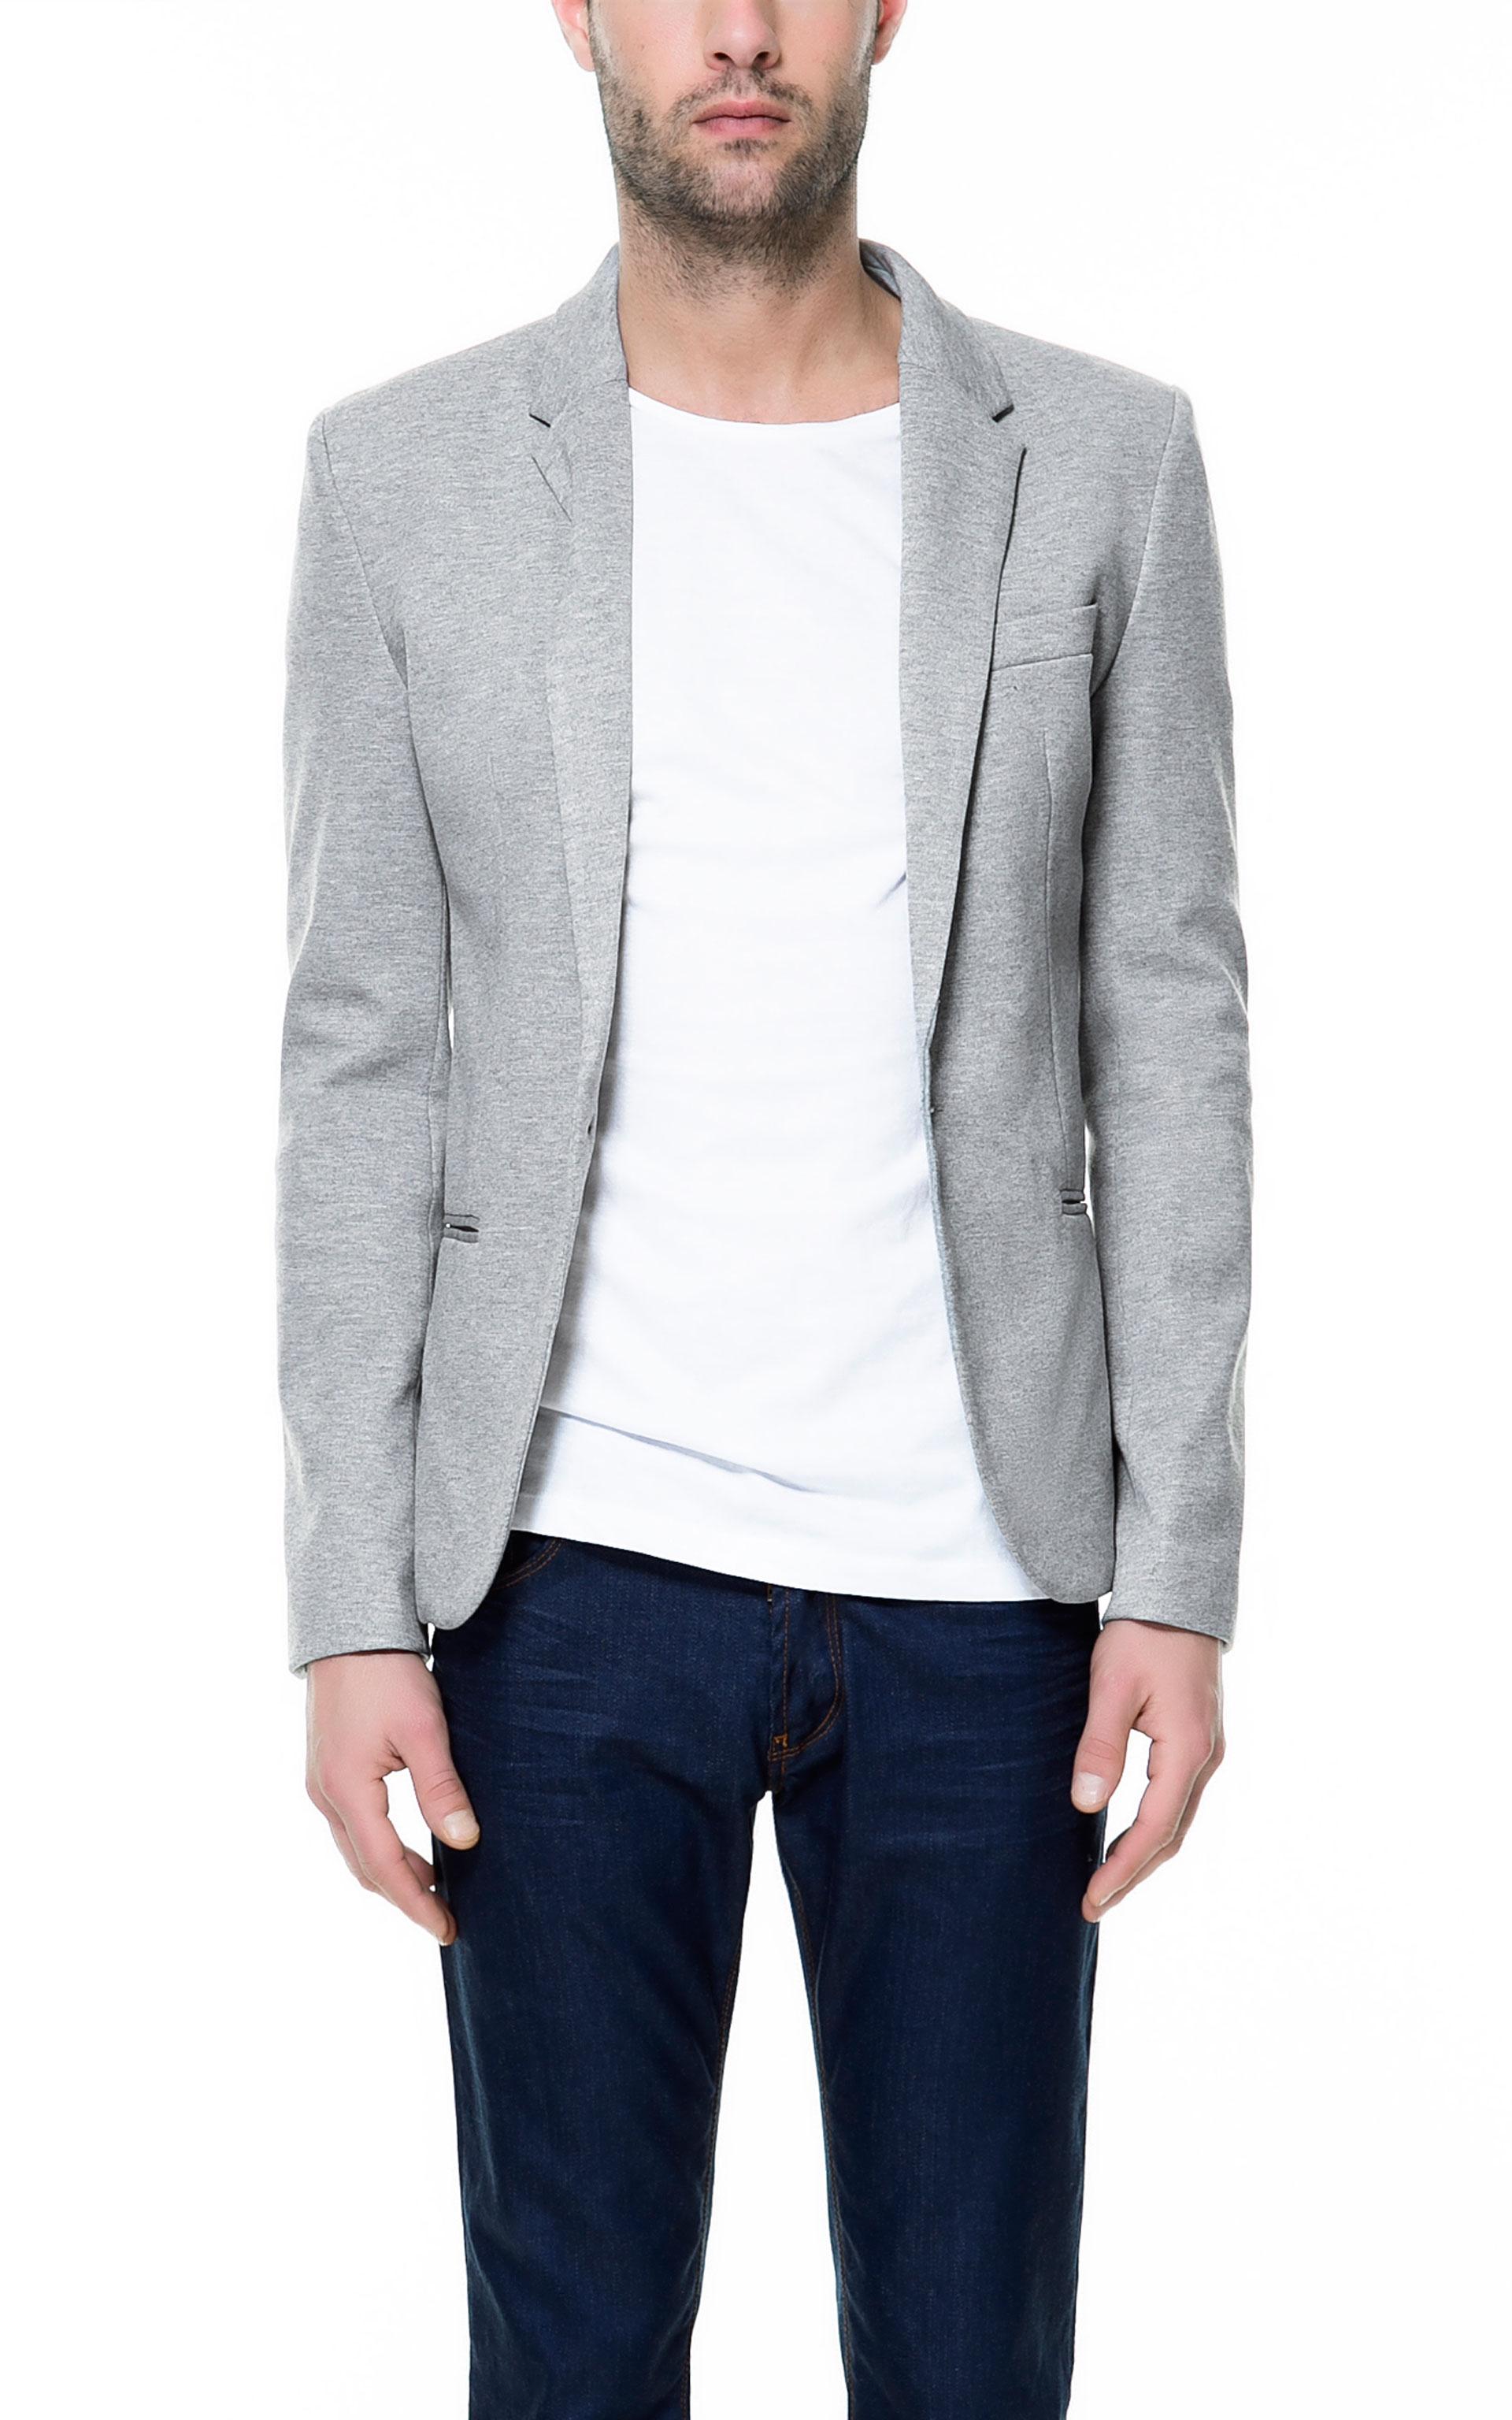 Zara Basic Blazer In Gray For Men Lyst